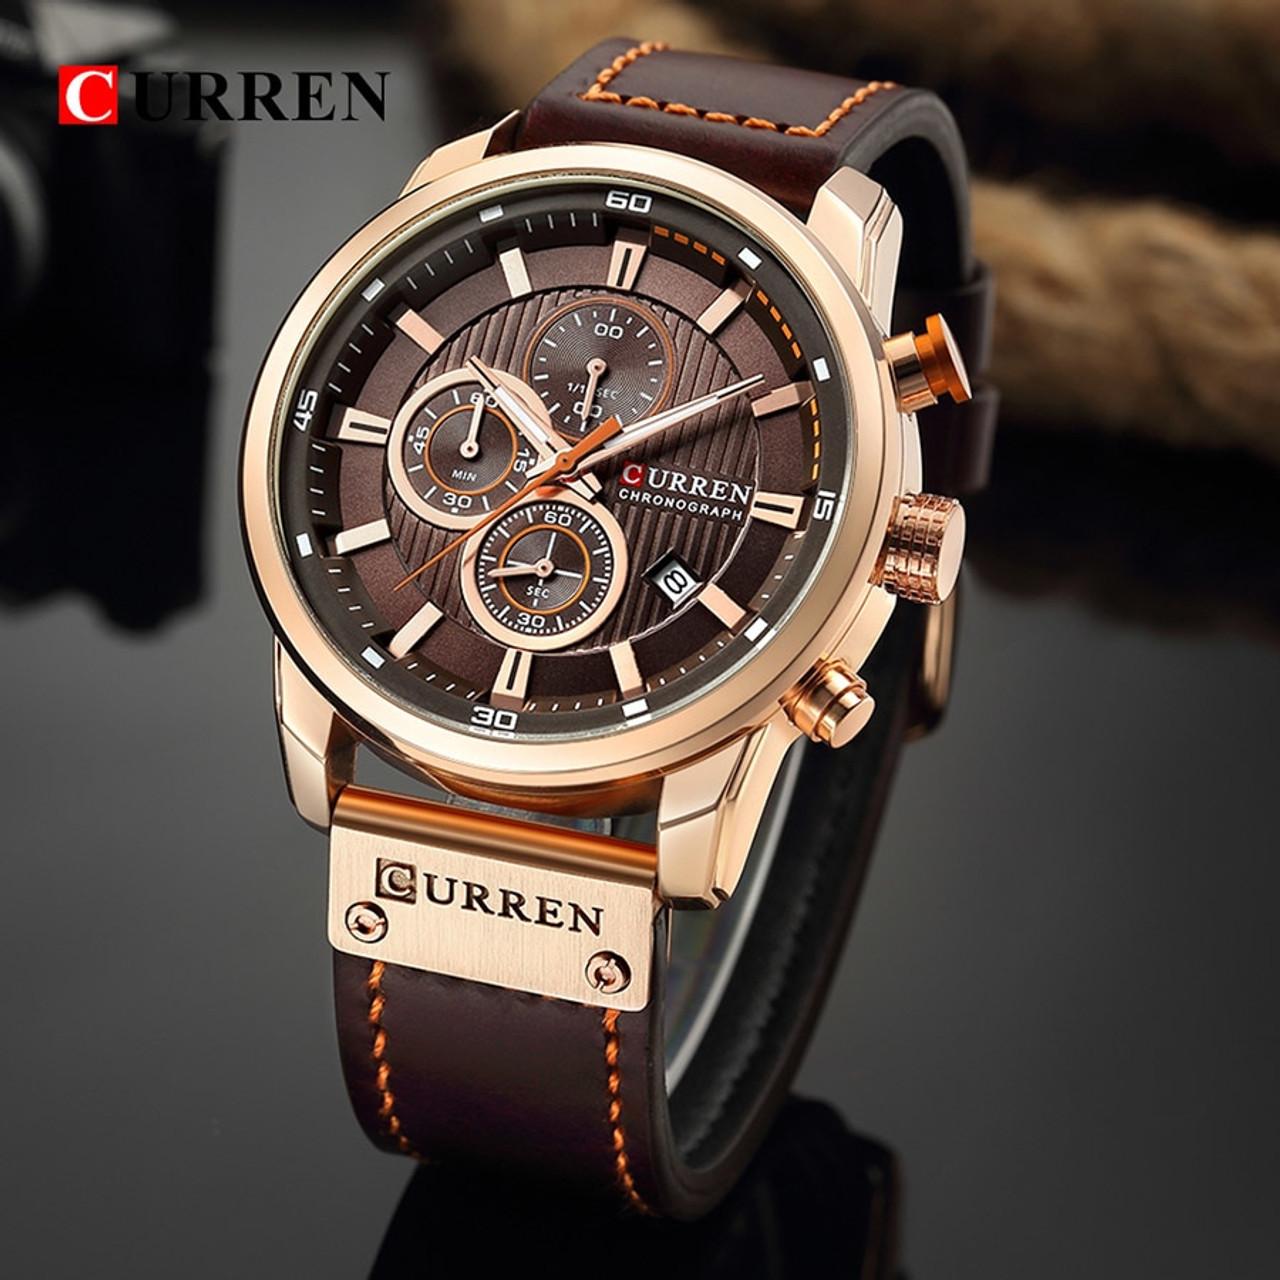 6513be284 Curren Watch Top Brand Man Watches with Chronograph Sport Waterproof Clock Man  Watches Military Luxury Men's Watch Analog Quartz - OnshopDeals.Com